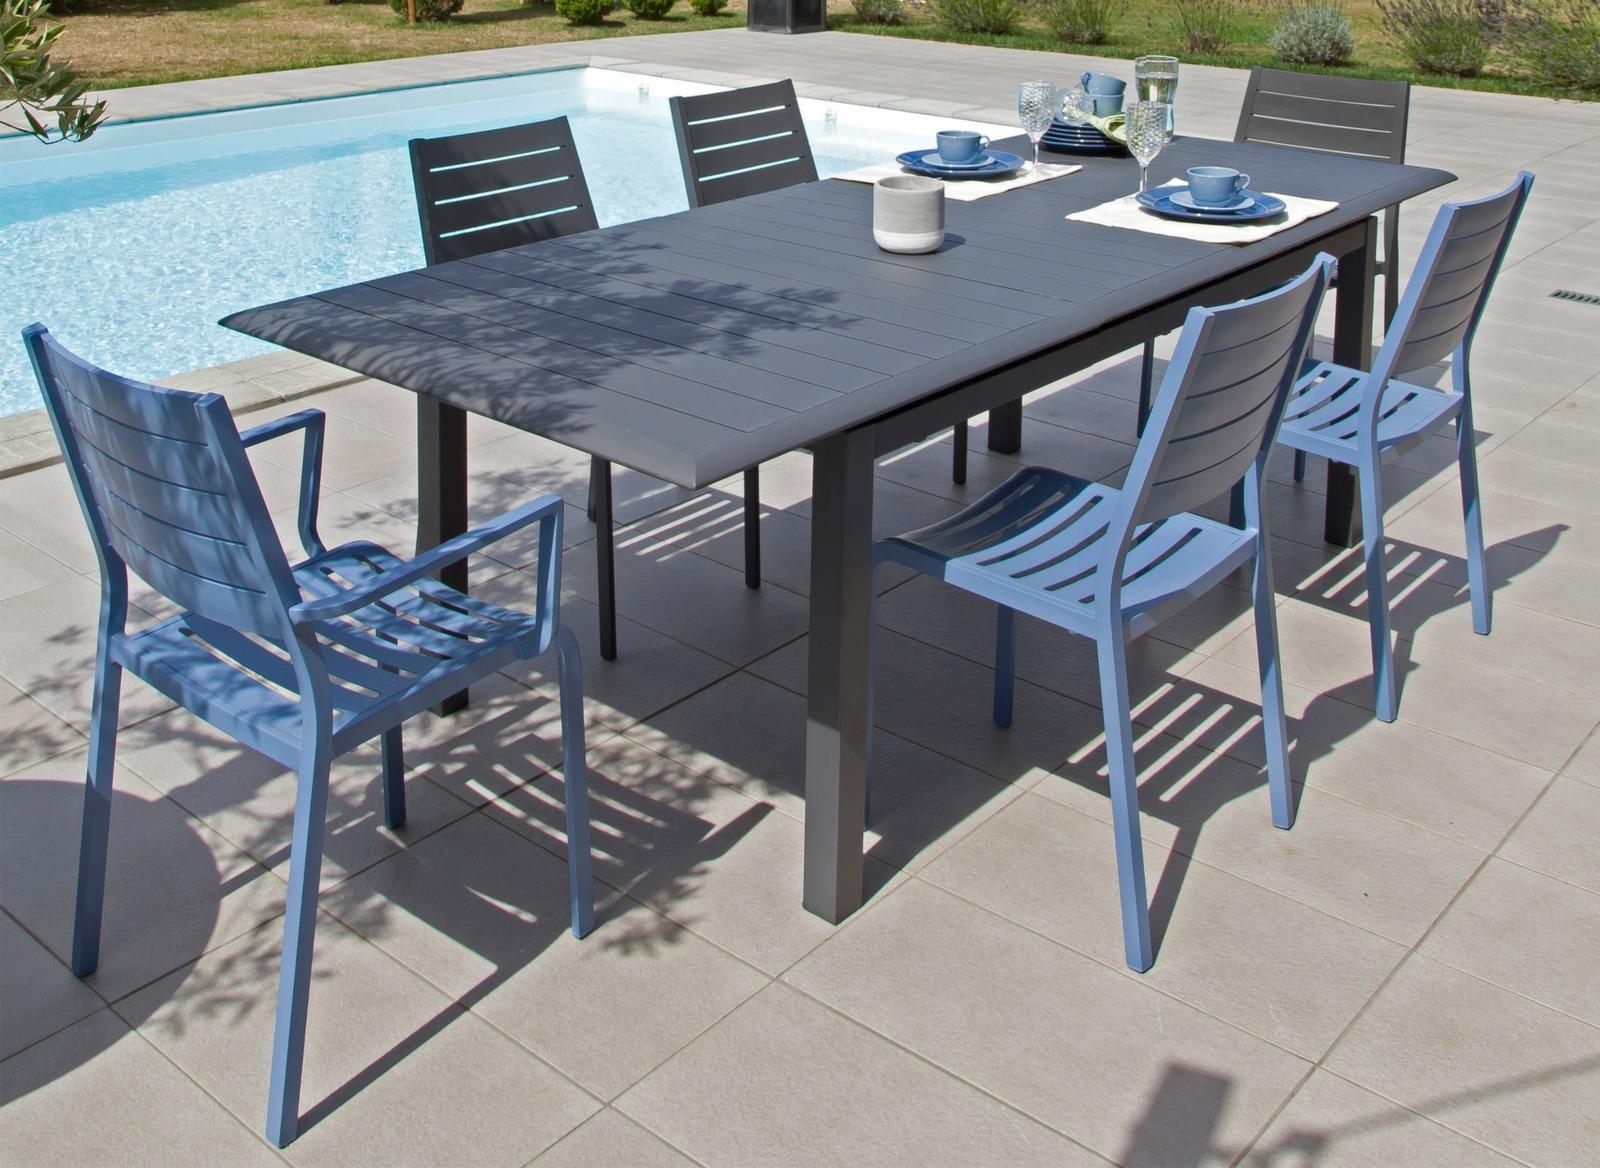 chaise de jardin aluminium flower mobilier de jardin proloisirs. Black Bedroom Furniture Sets. Home Design Ideas